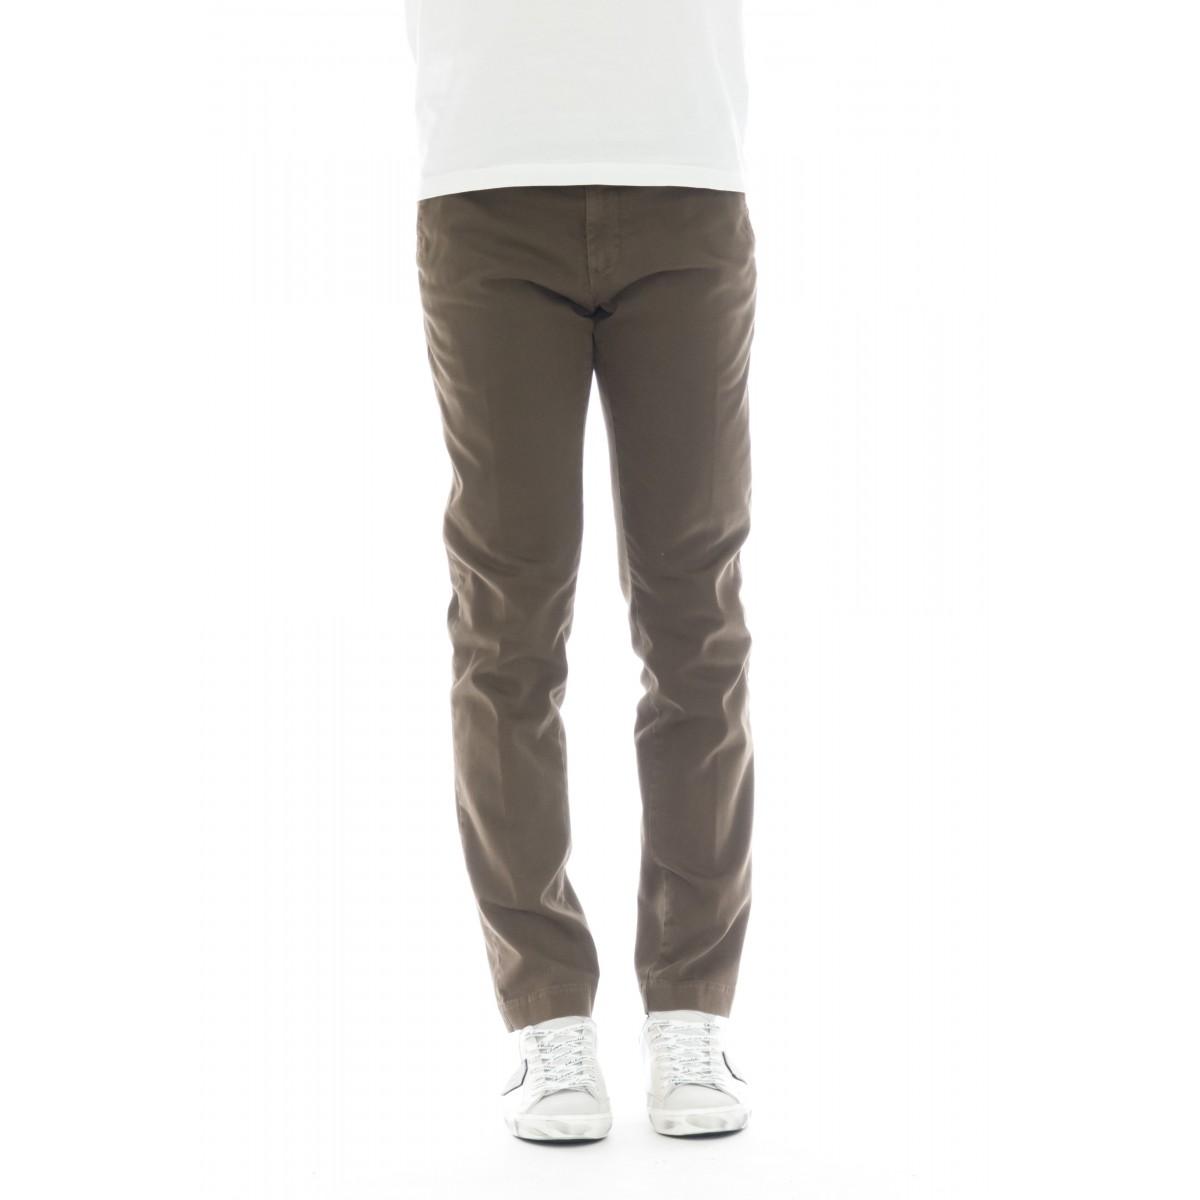 Pantalone uomo - 08l 05 gabardina strech slim lavata